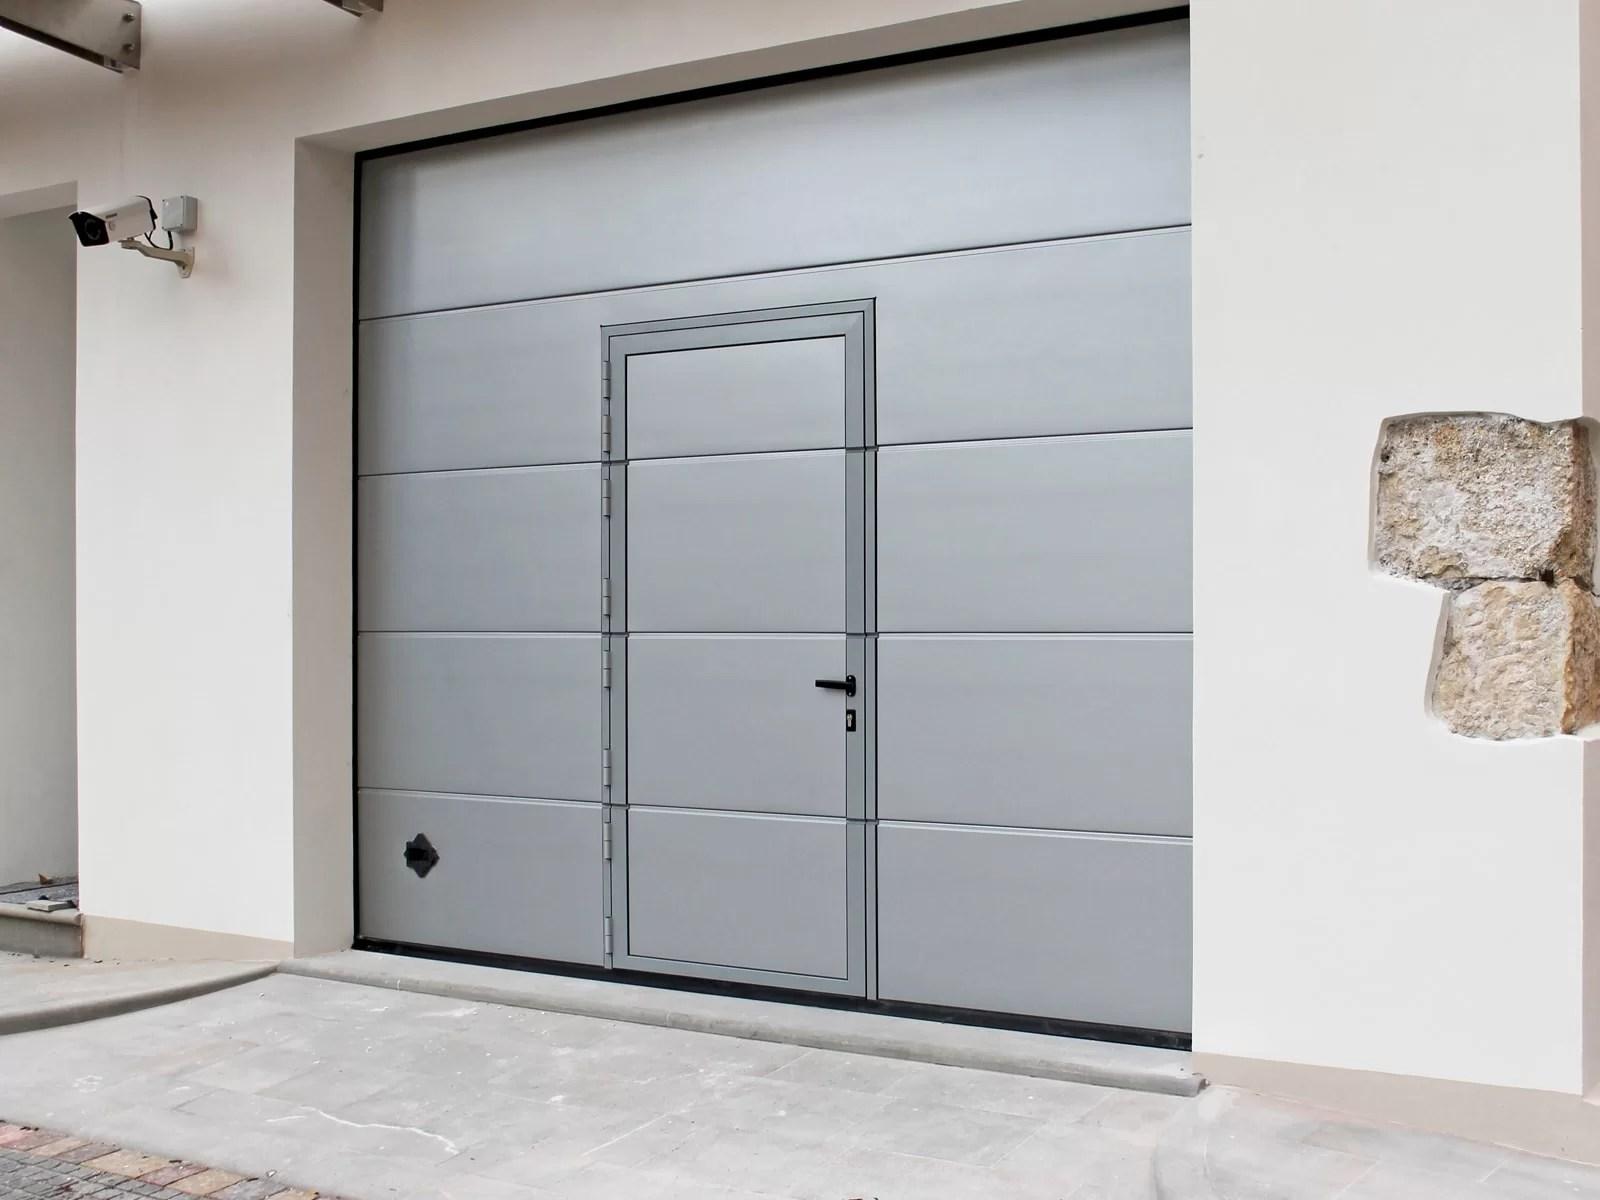 Portone sezionale da garage PERSUS - Liscio grigio 9006 porta pedonale ribassata